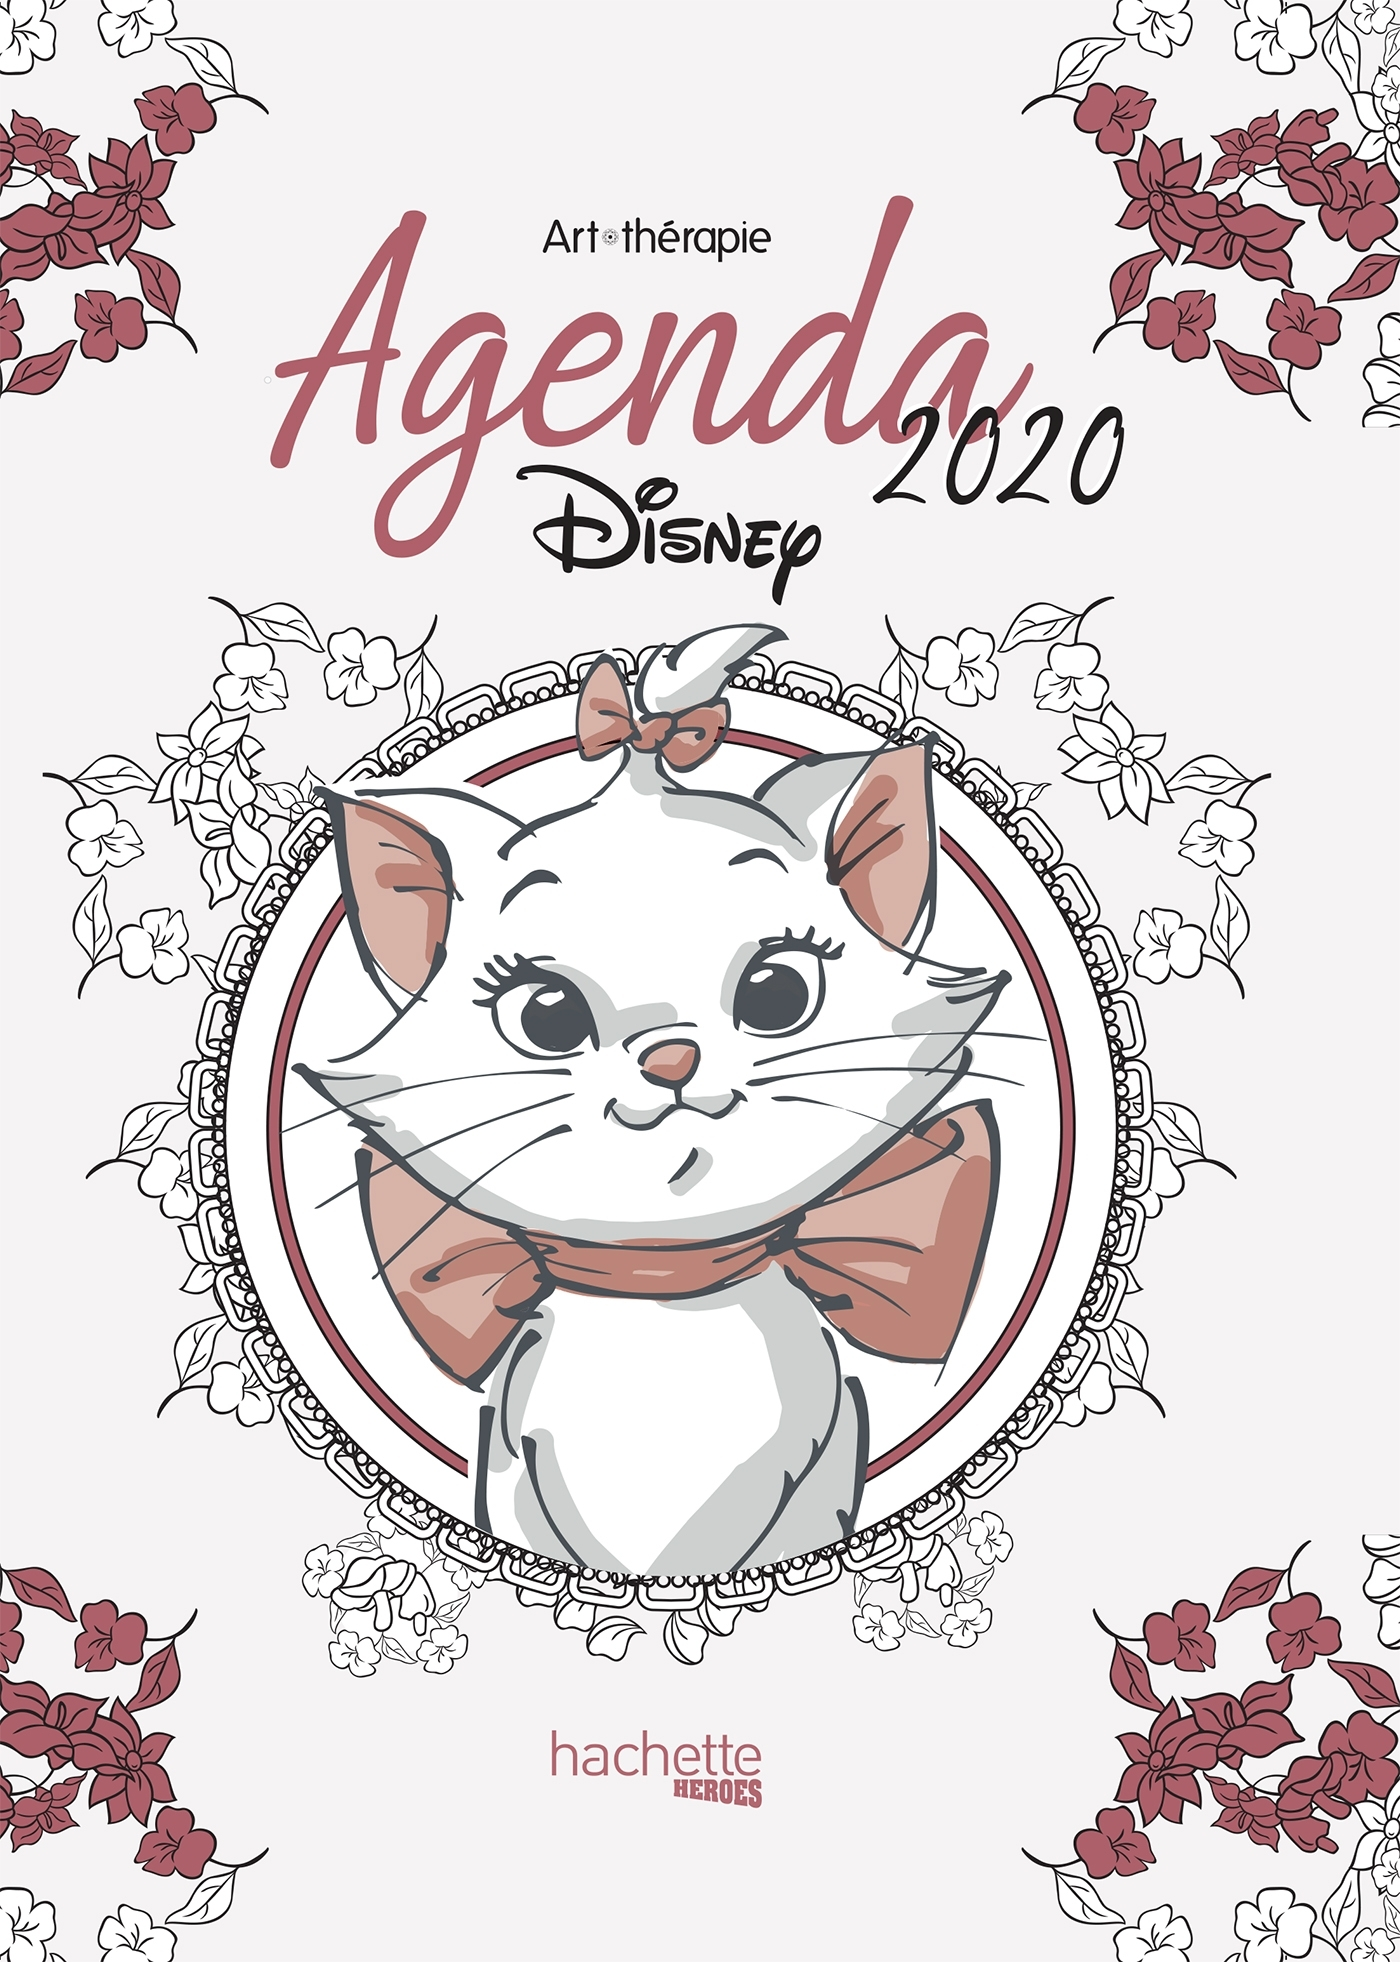 ART-THERAPIE AGENDA DISNEY 2020